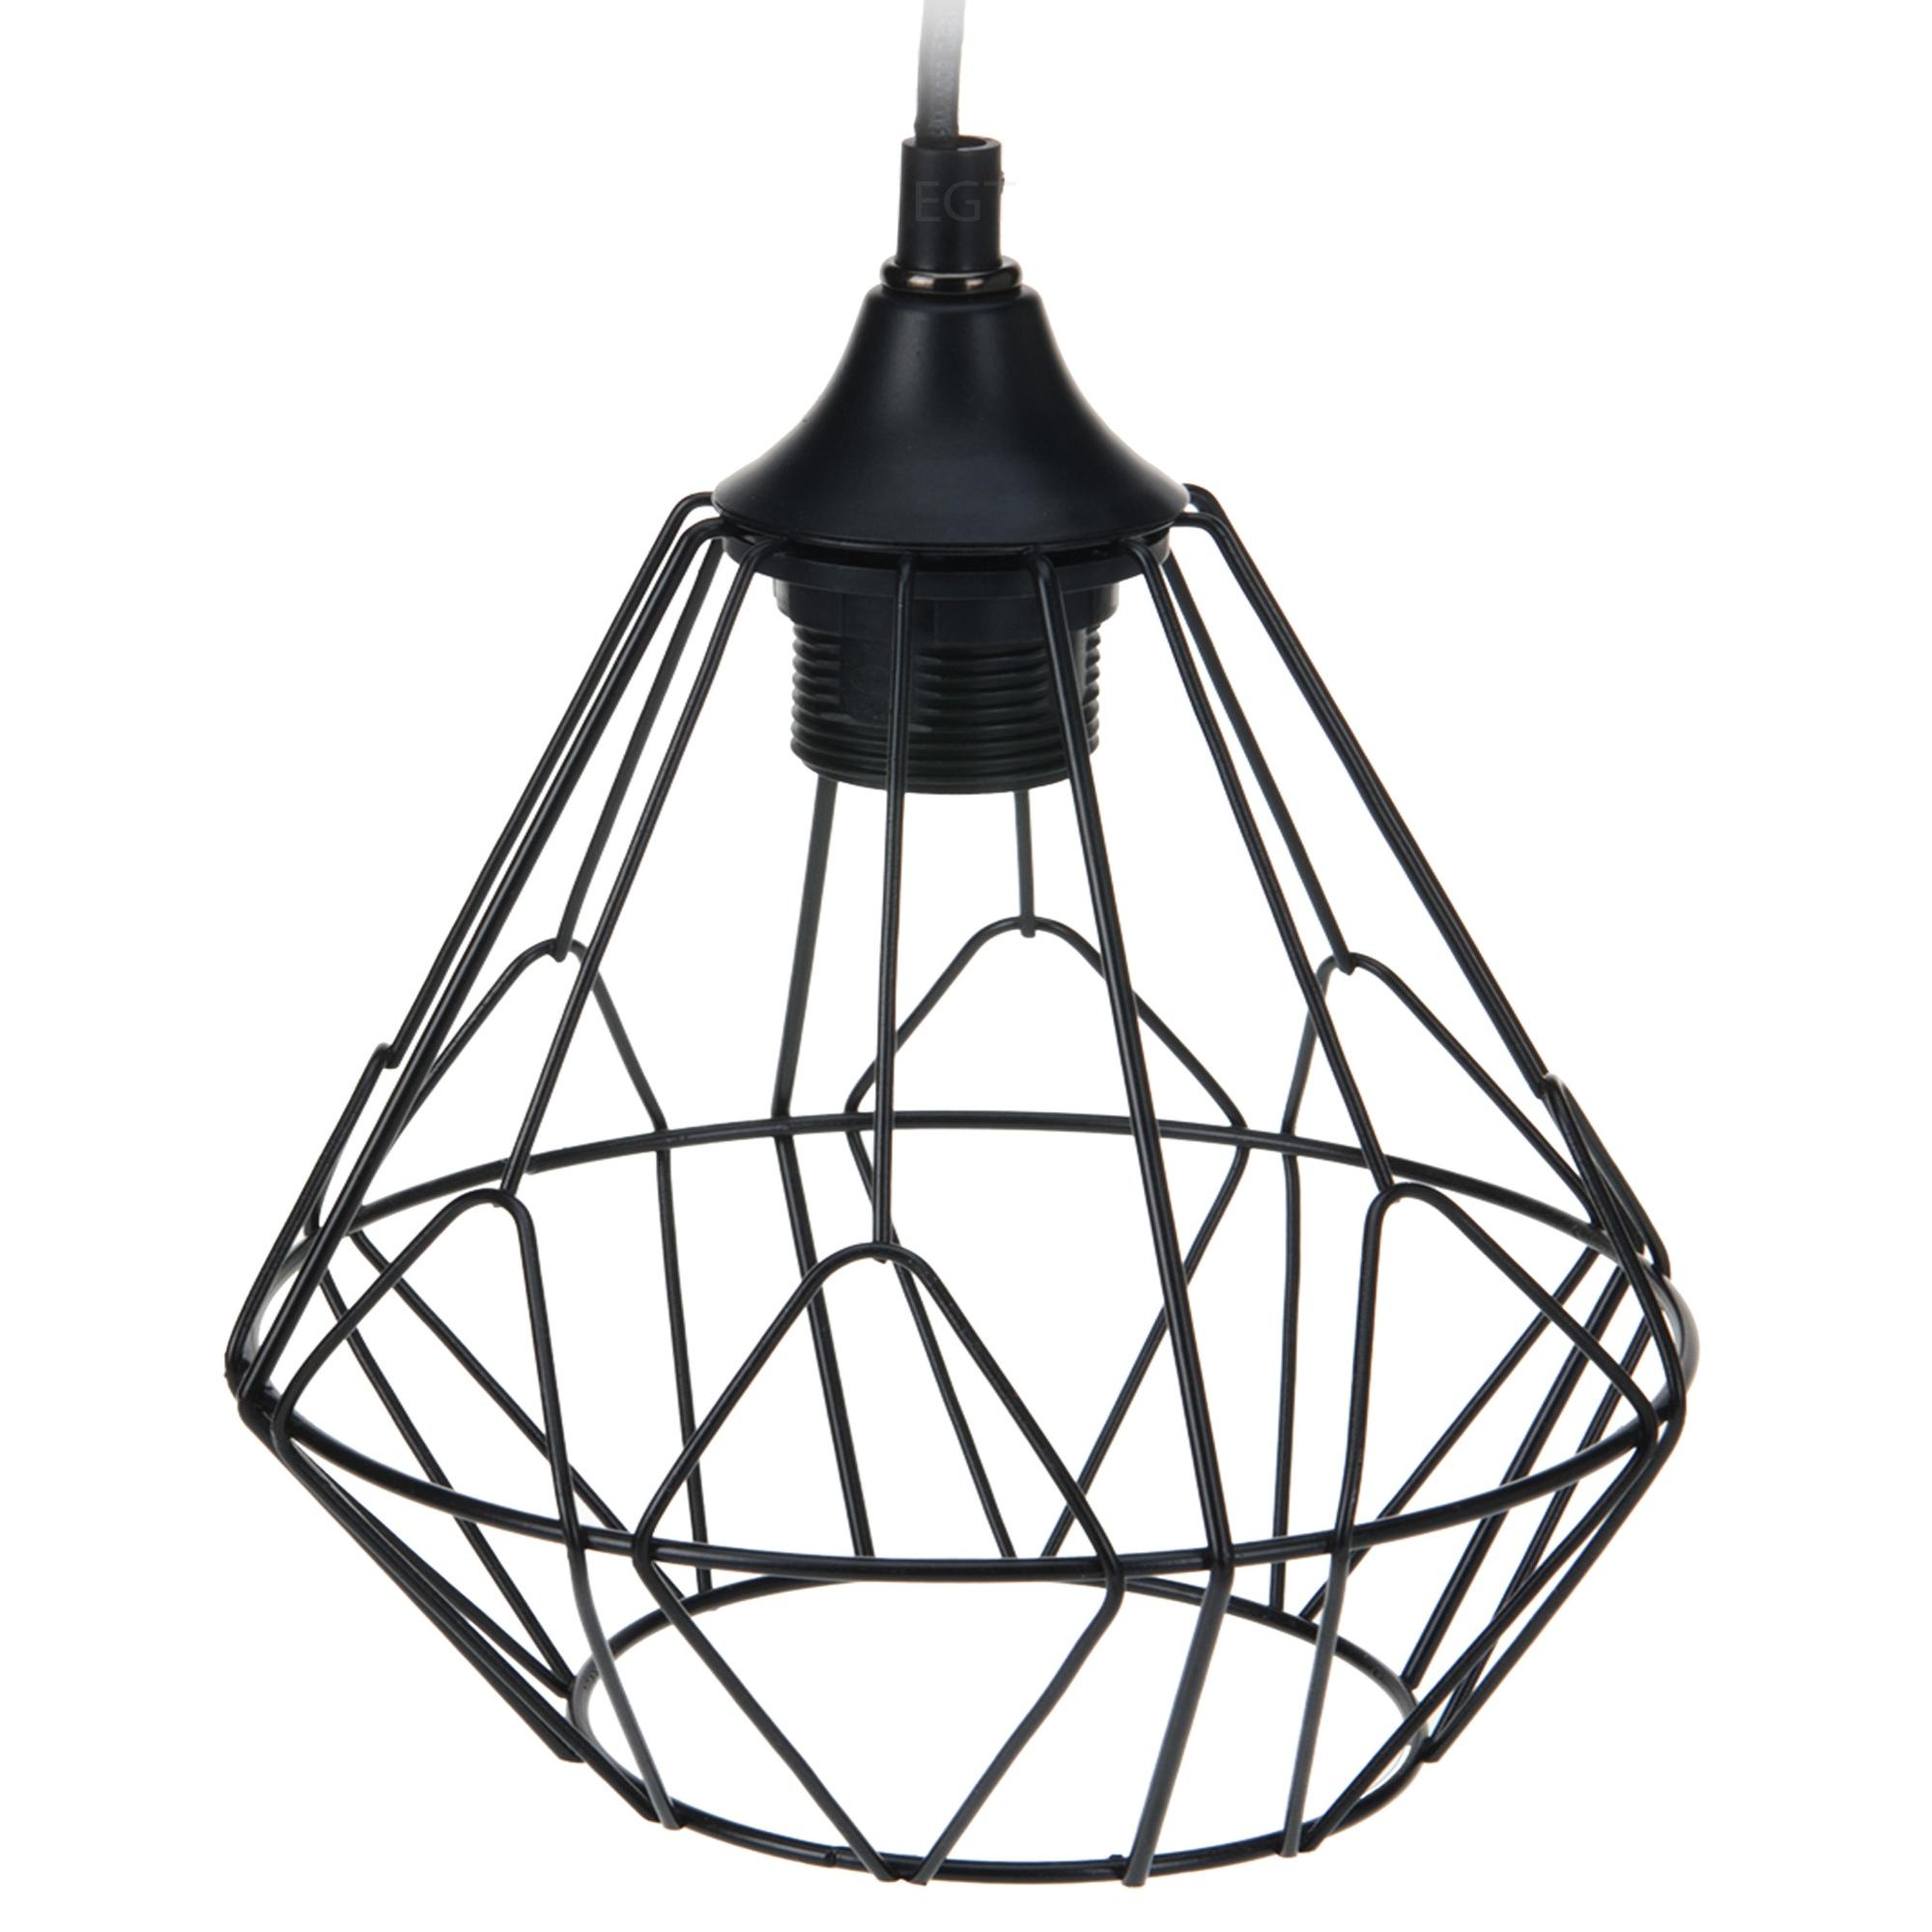 Modern Black Geometric Metal Wire Hanging Ceiling Light Pendant ...